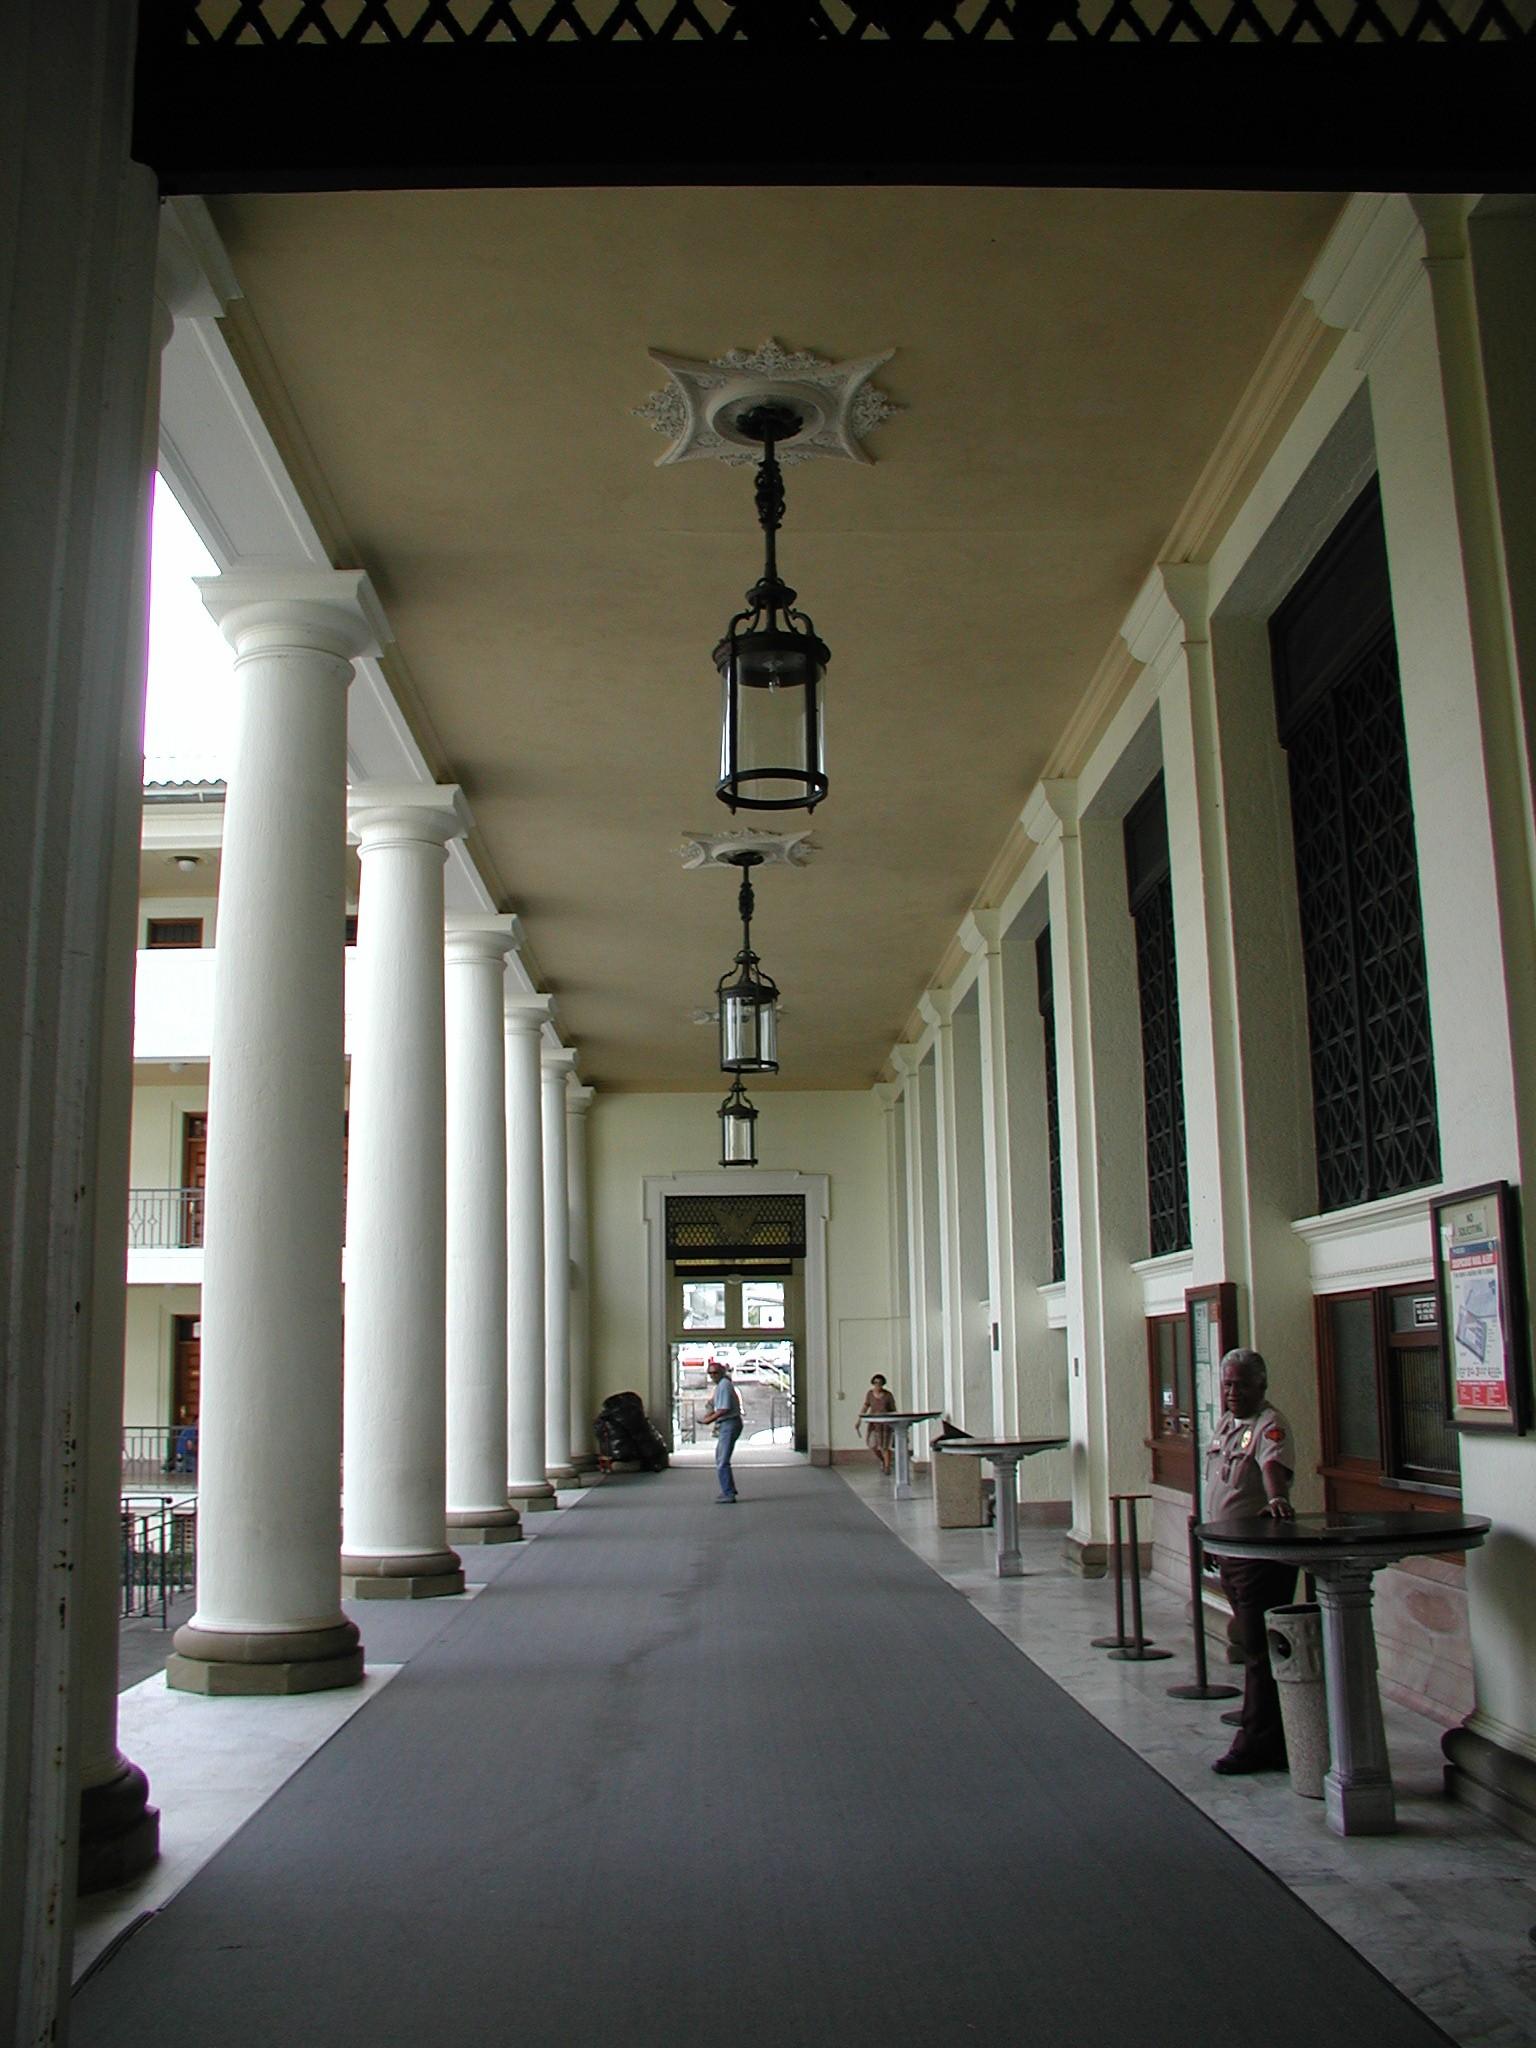 Hilo Fed Corridor